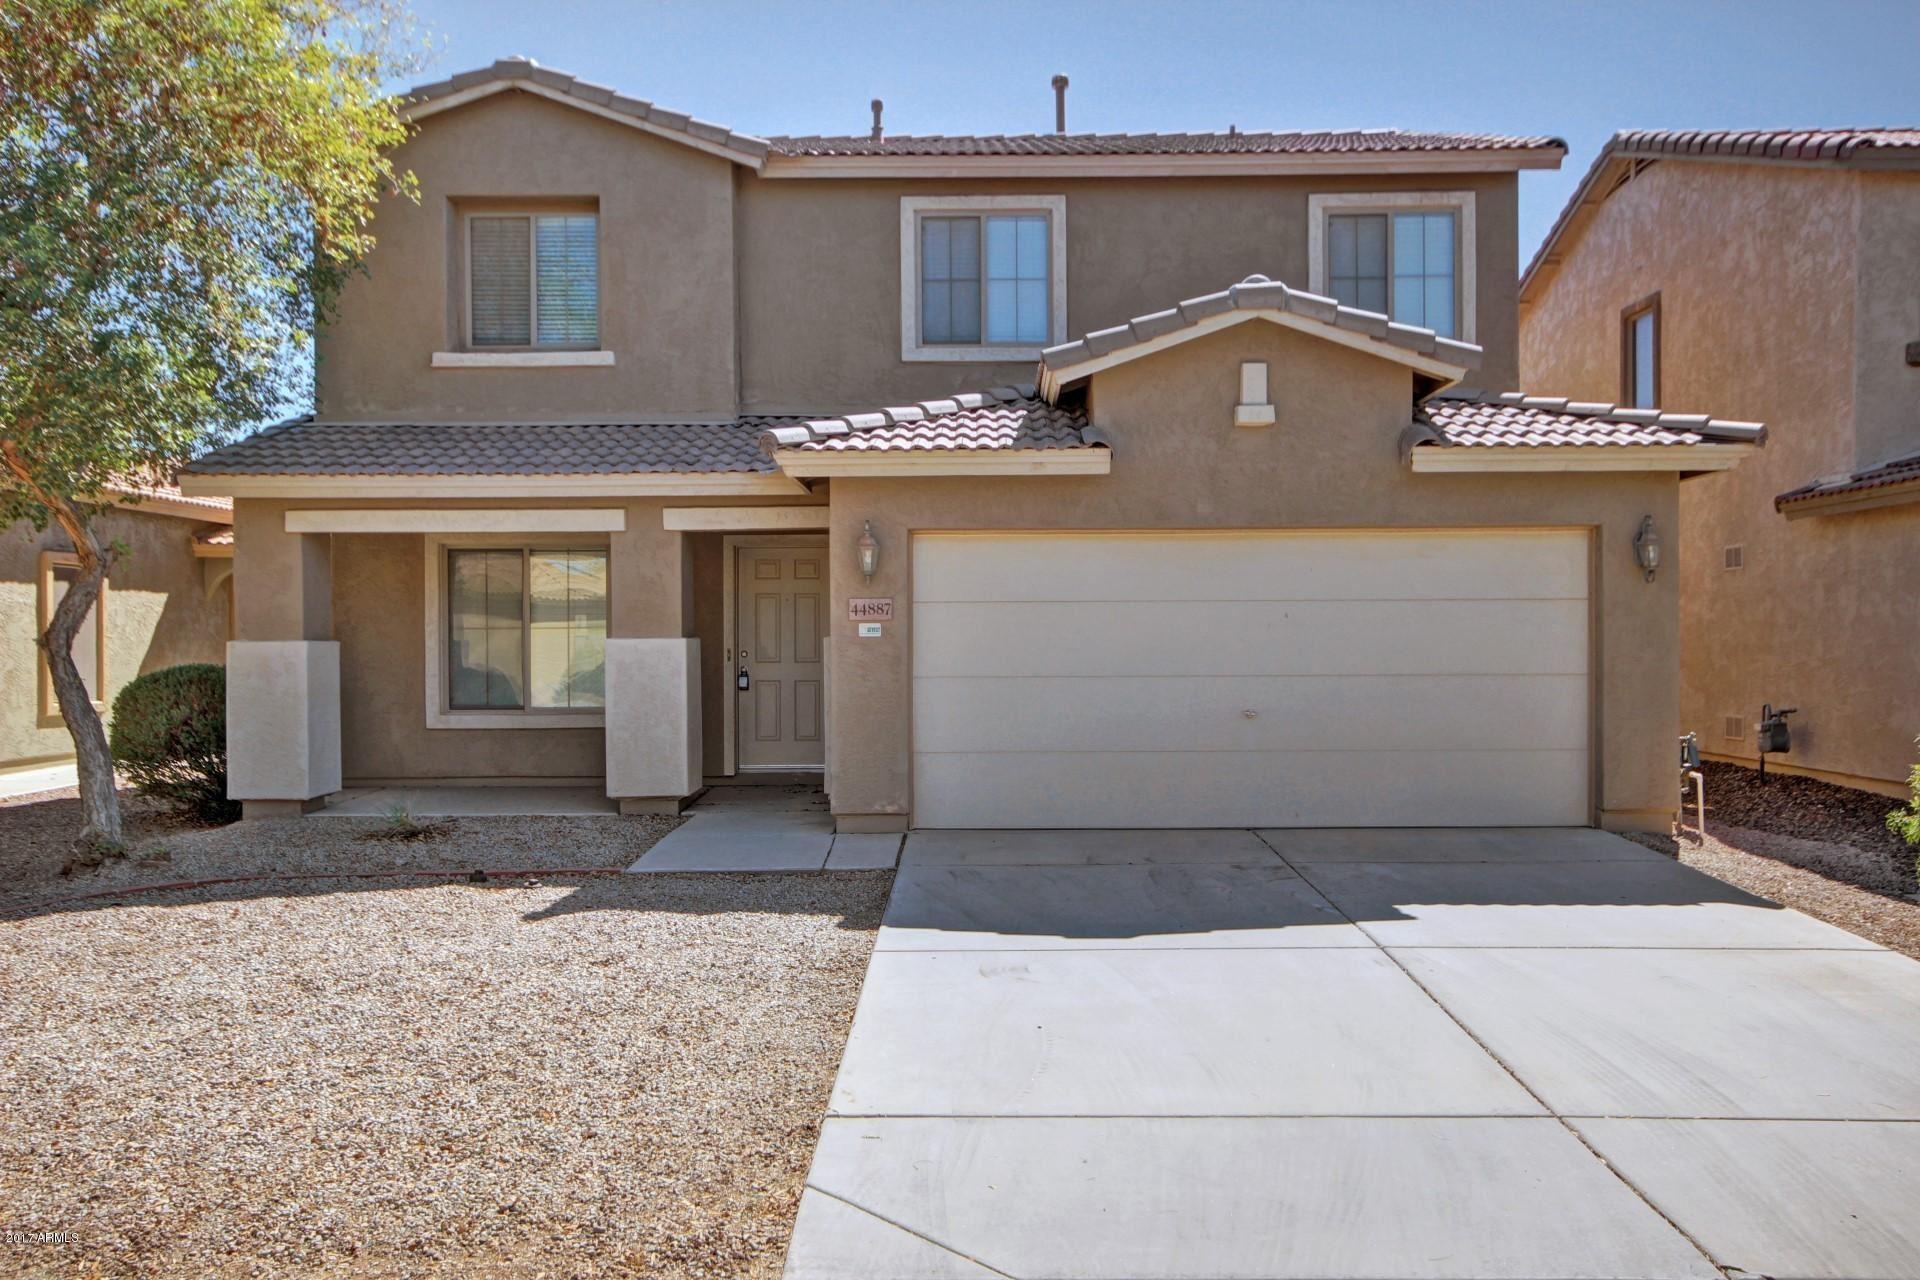 Photo for 44887 W Bahia Drive, Maricopa, AZ 85139 (MLS # 6251003)